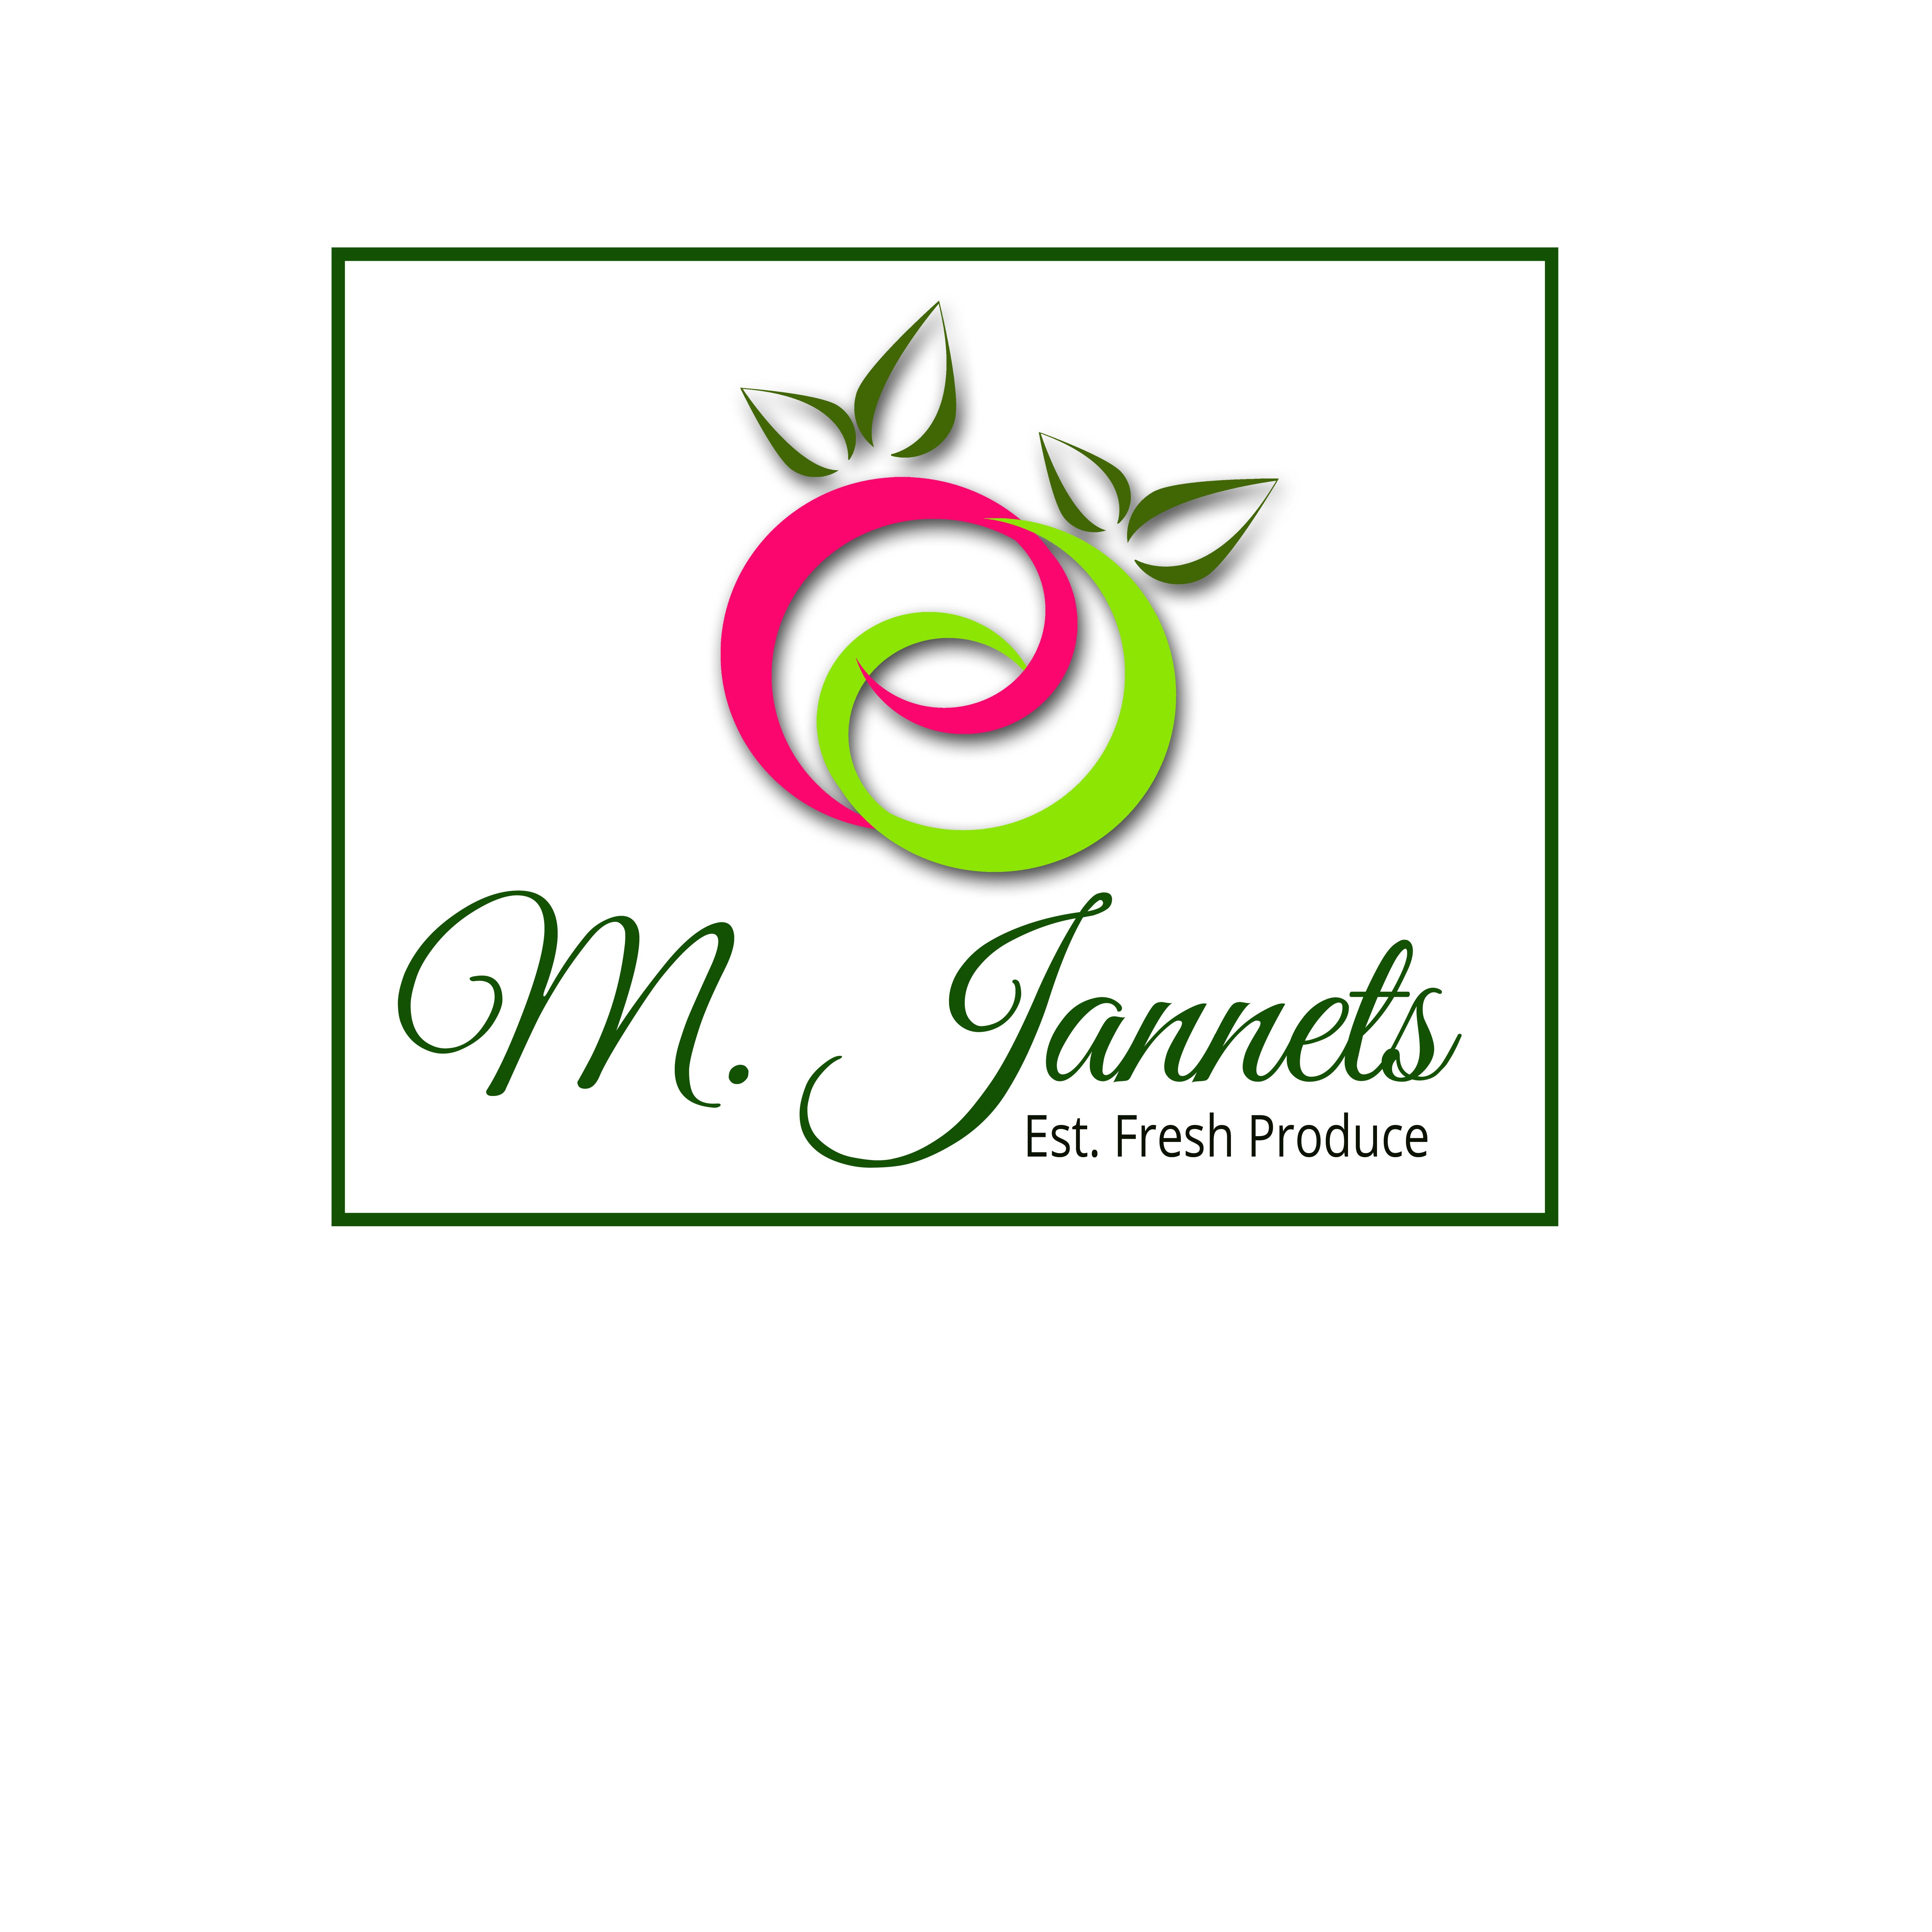 Logo Design by Allan Esclamado - Entry No. 12 in the Logo Design Contest Inspiring Logo Design for M. Jannets.